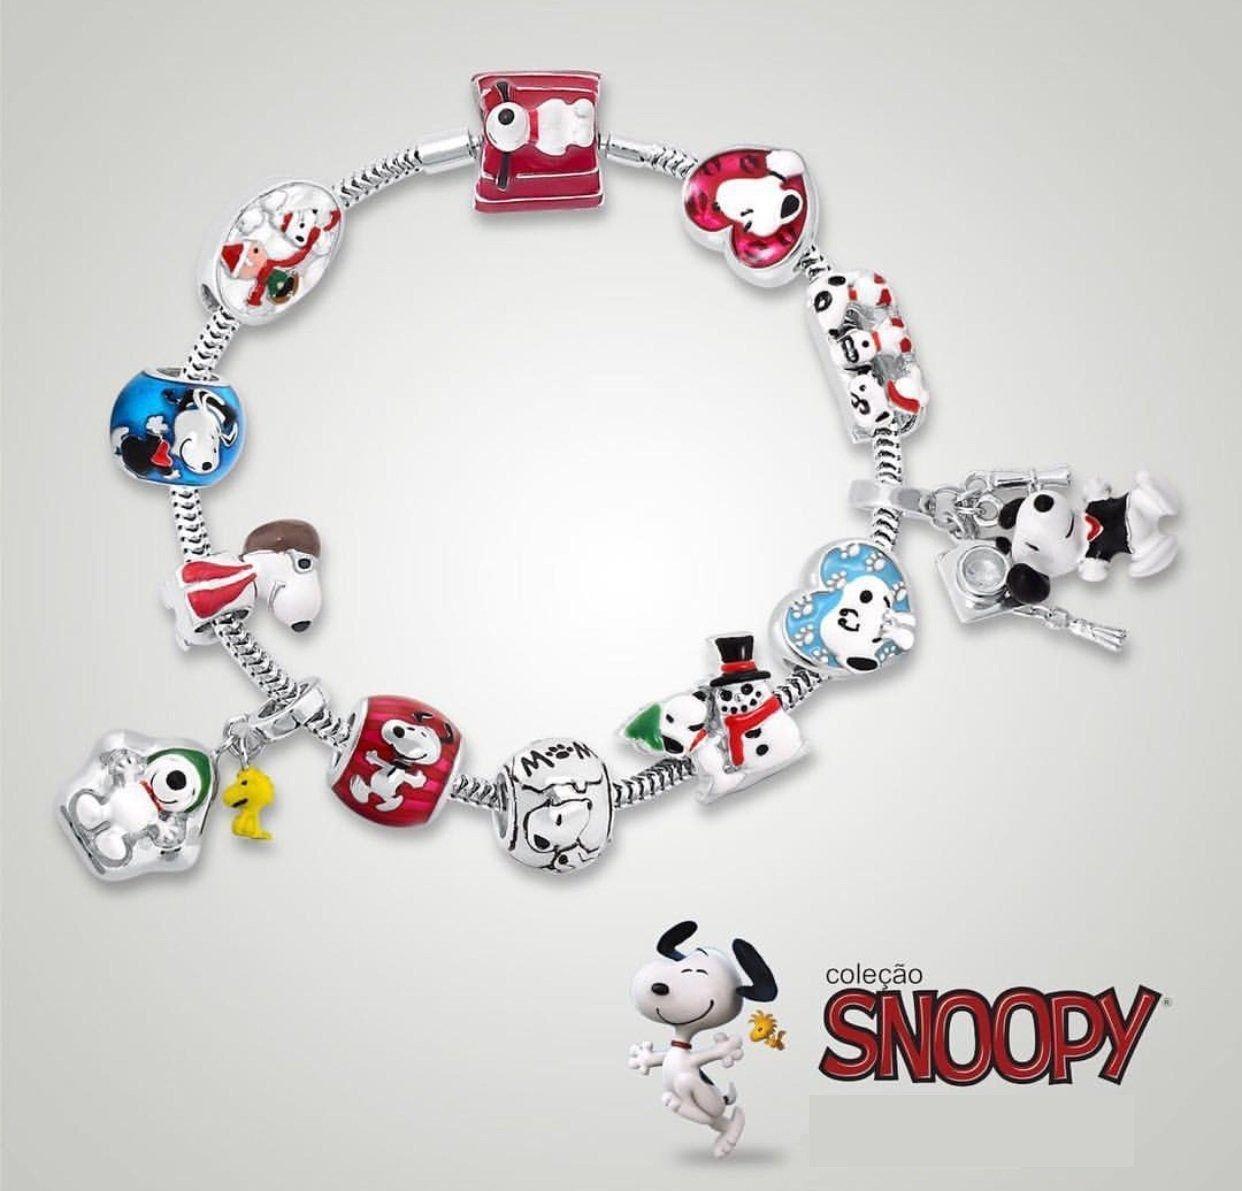 Berloque Snoopy Super-Herói